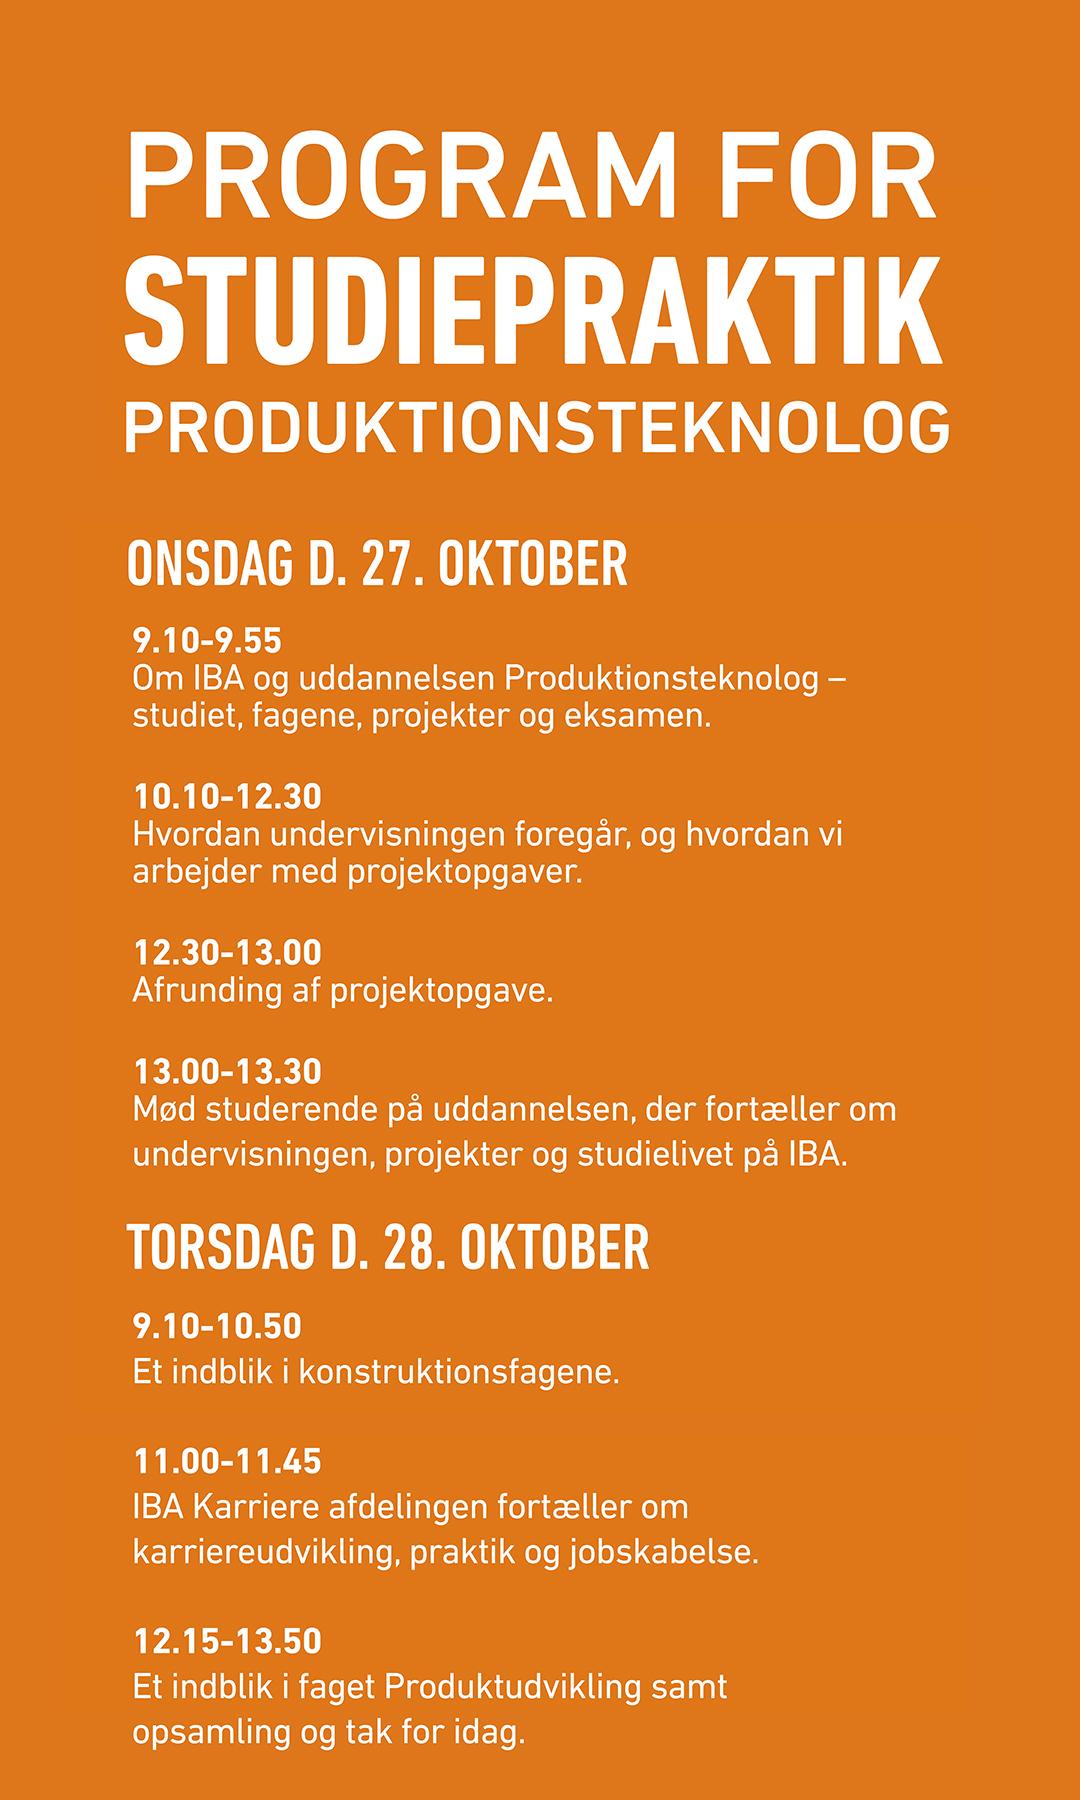 Program for studiepraktik for Produktionsteknolog.